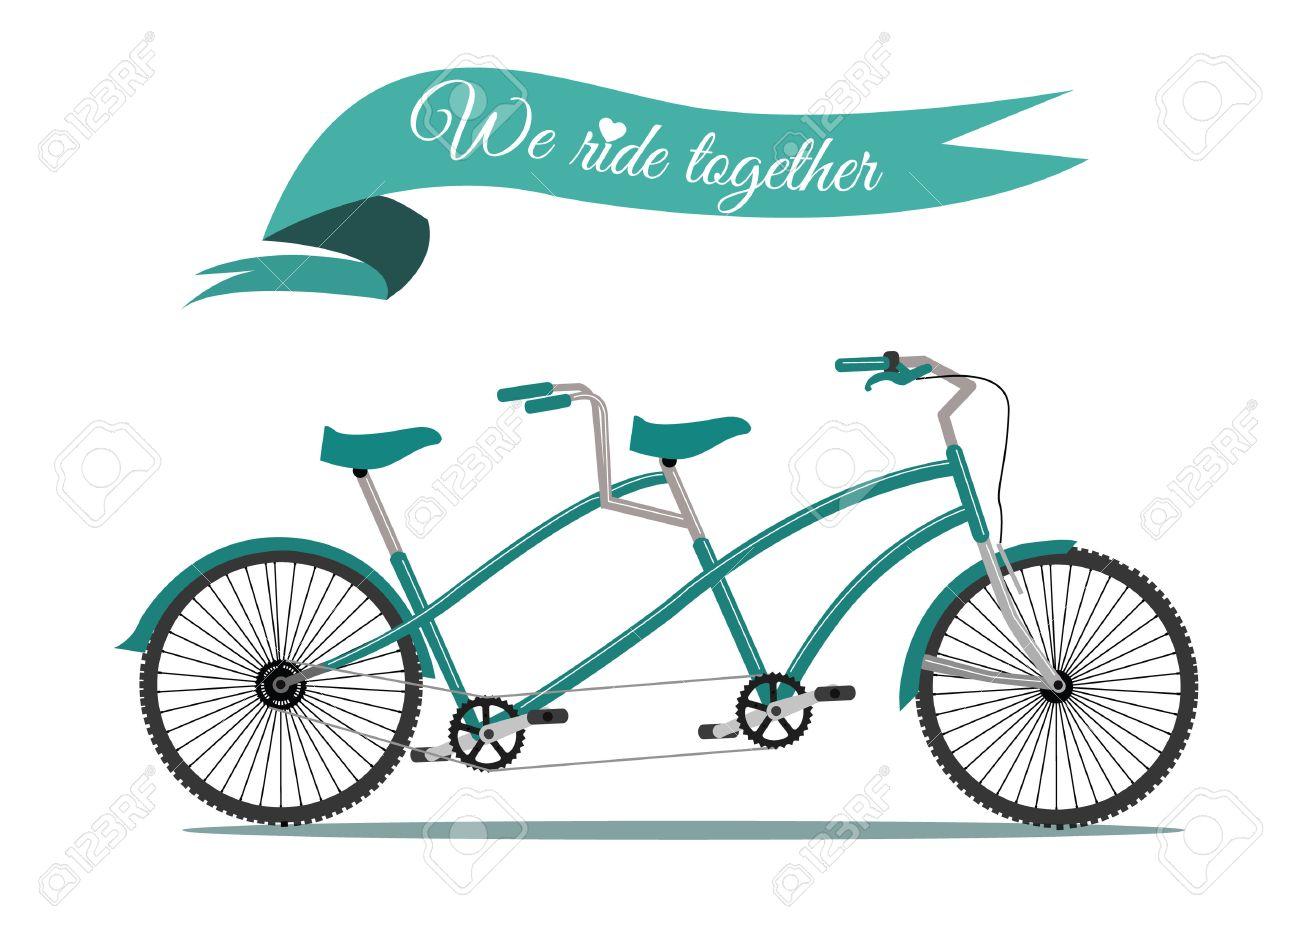 We ride together vintage tandem bicycle vector - 26321277